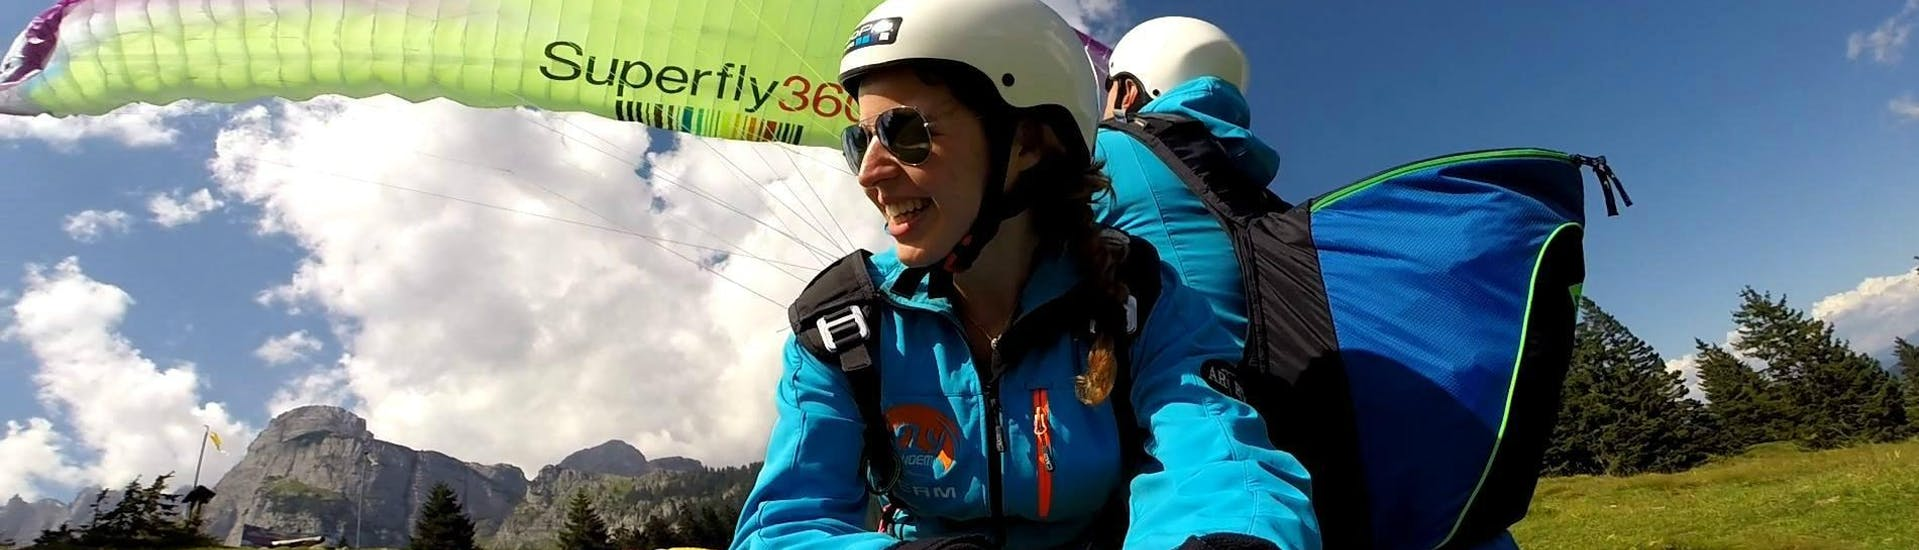 tandem-paragliding-in-molveno-ifly-tandem-hero